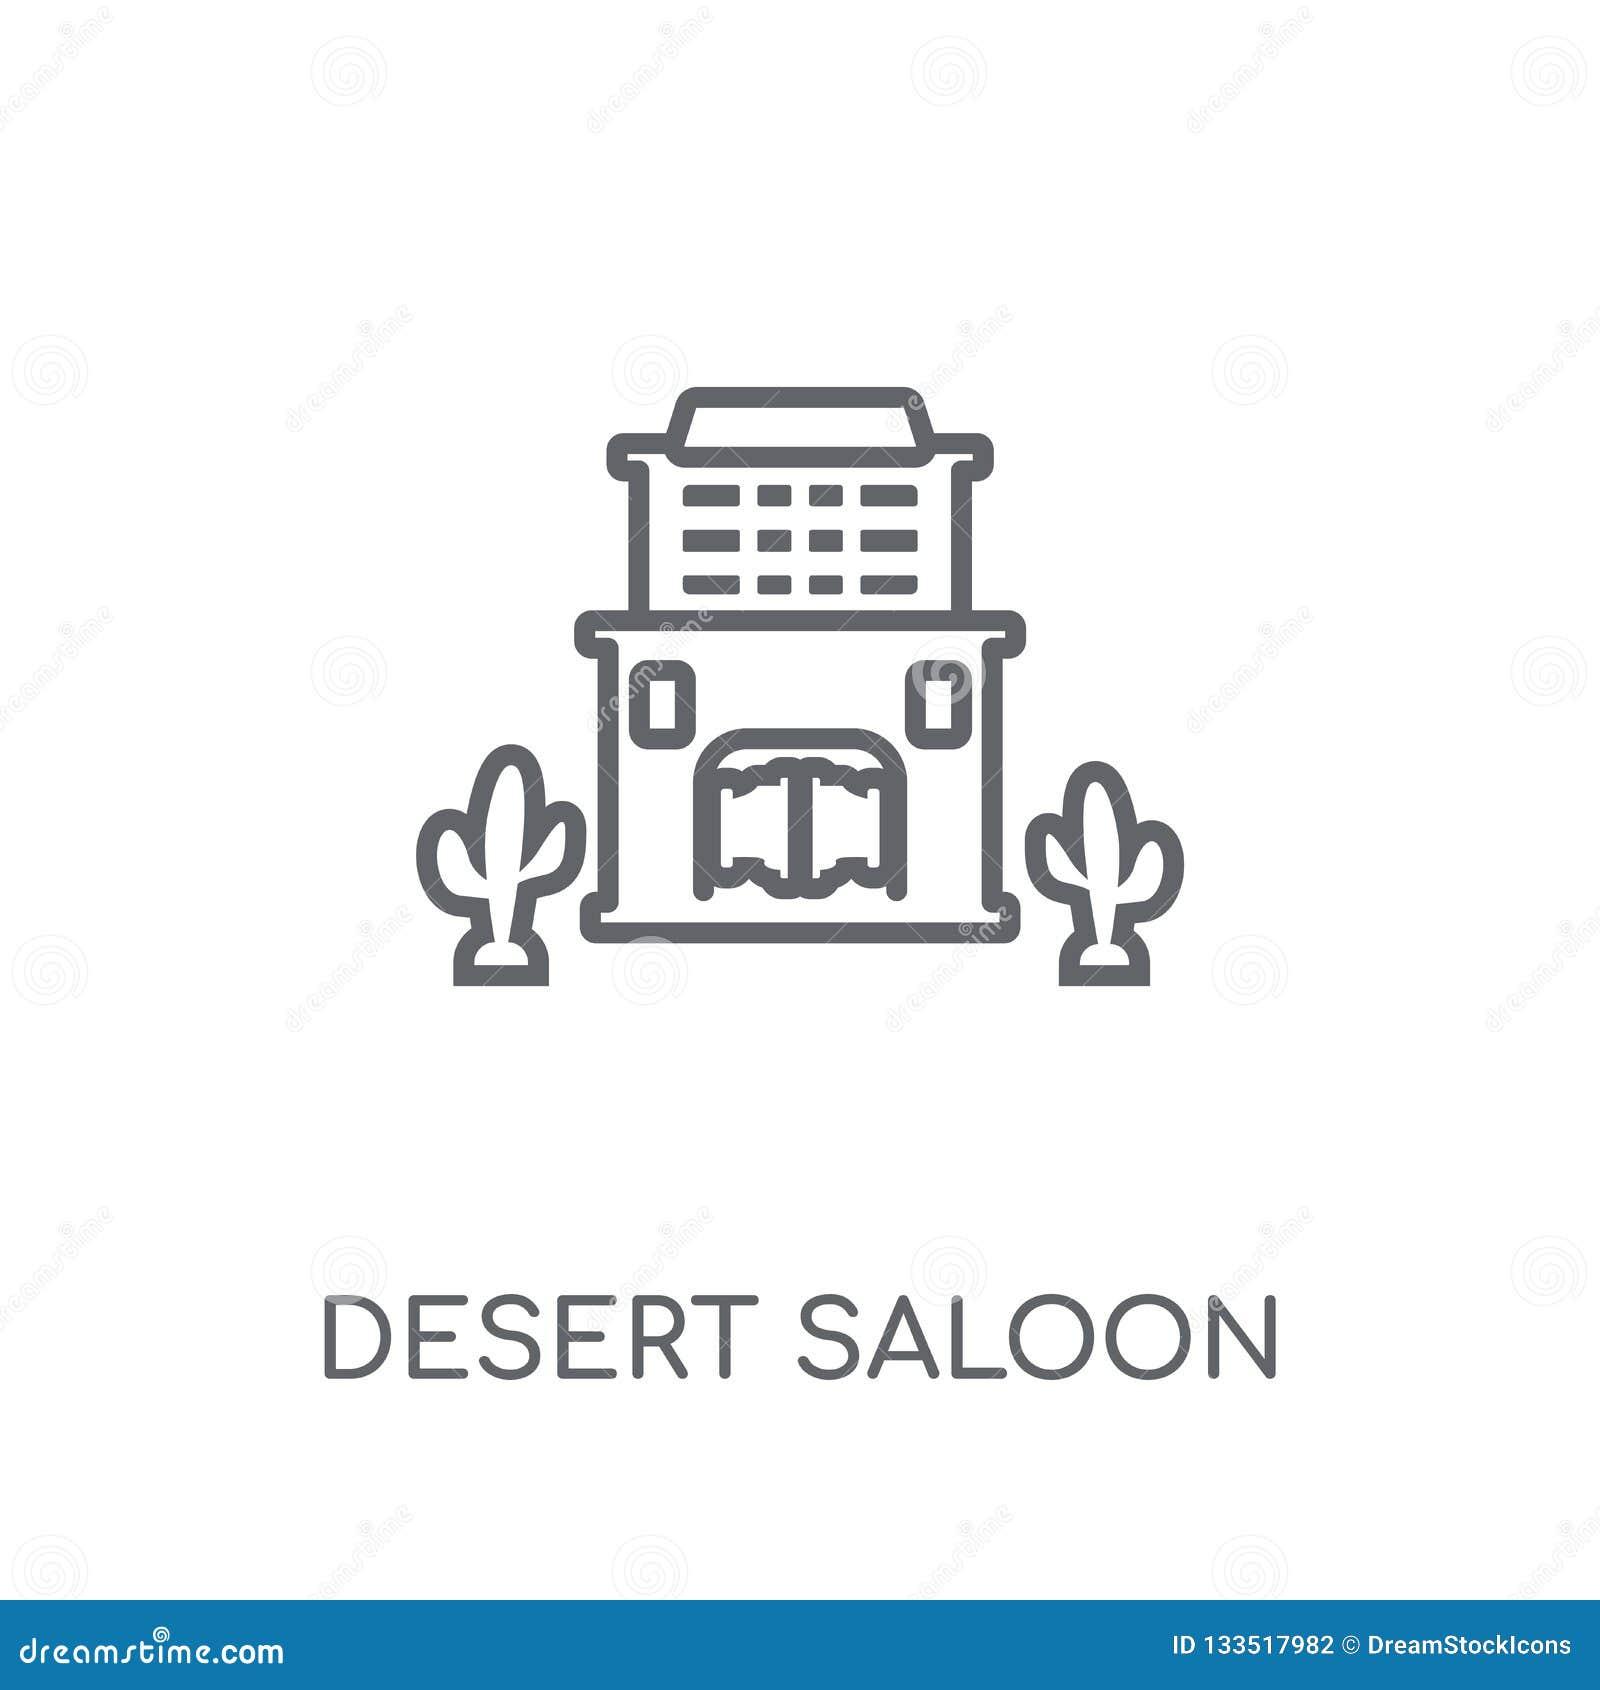 Desert saloon linear icon. Modern outline Desert saloon logo con